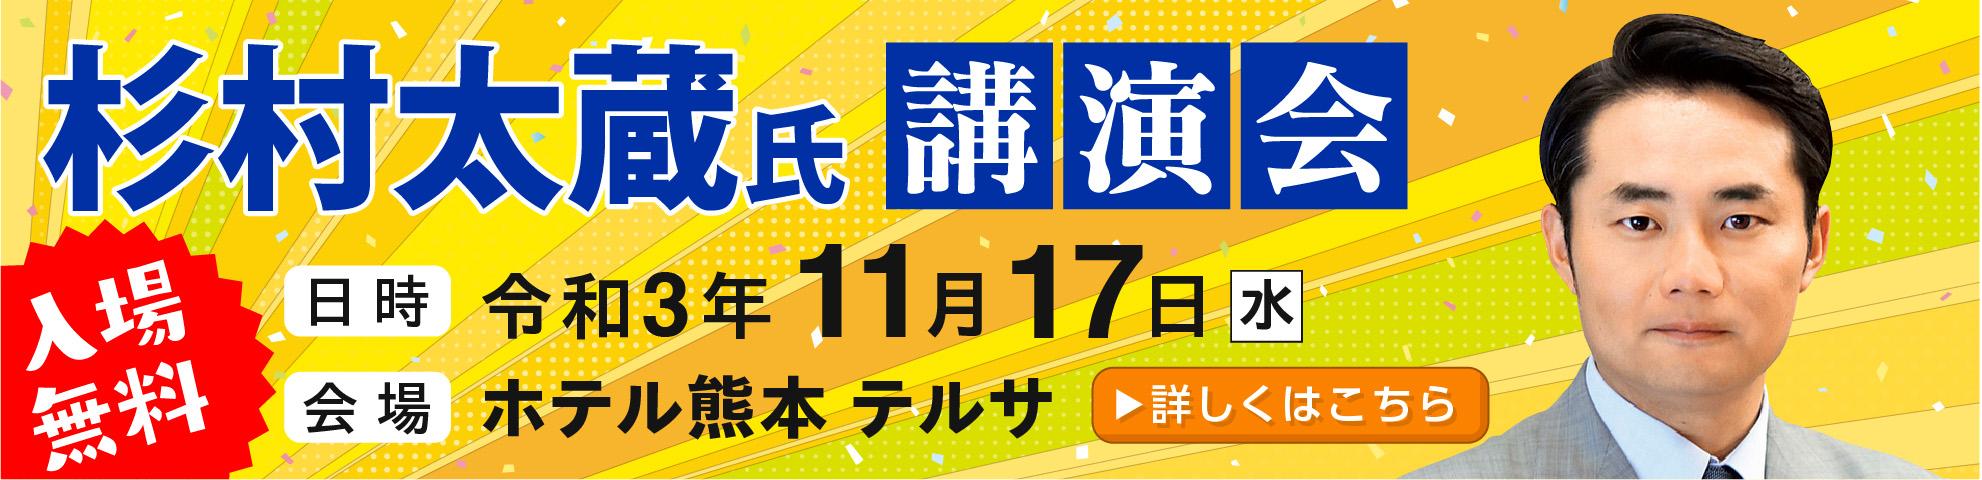 杉村太蔵氏講演会 入場無料 令和3年11月17日水曜日 ホテル熊本テルサ